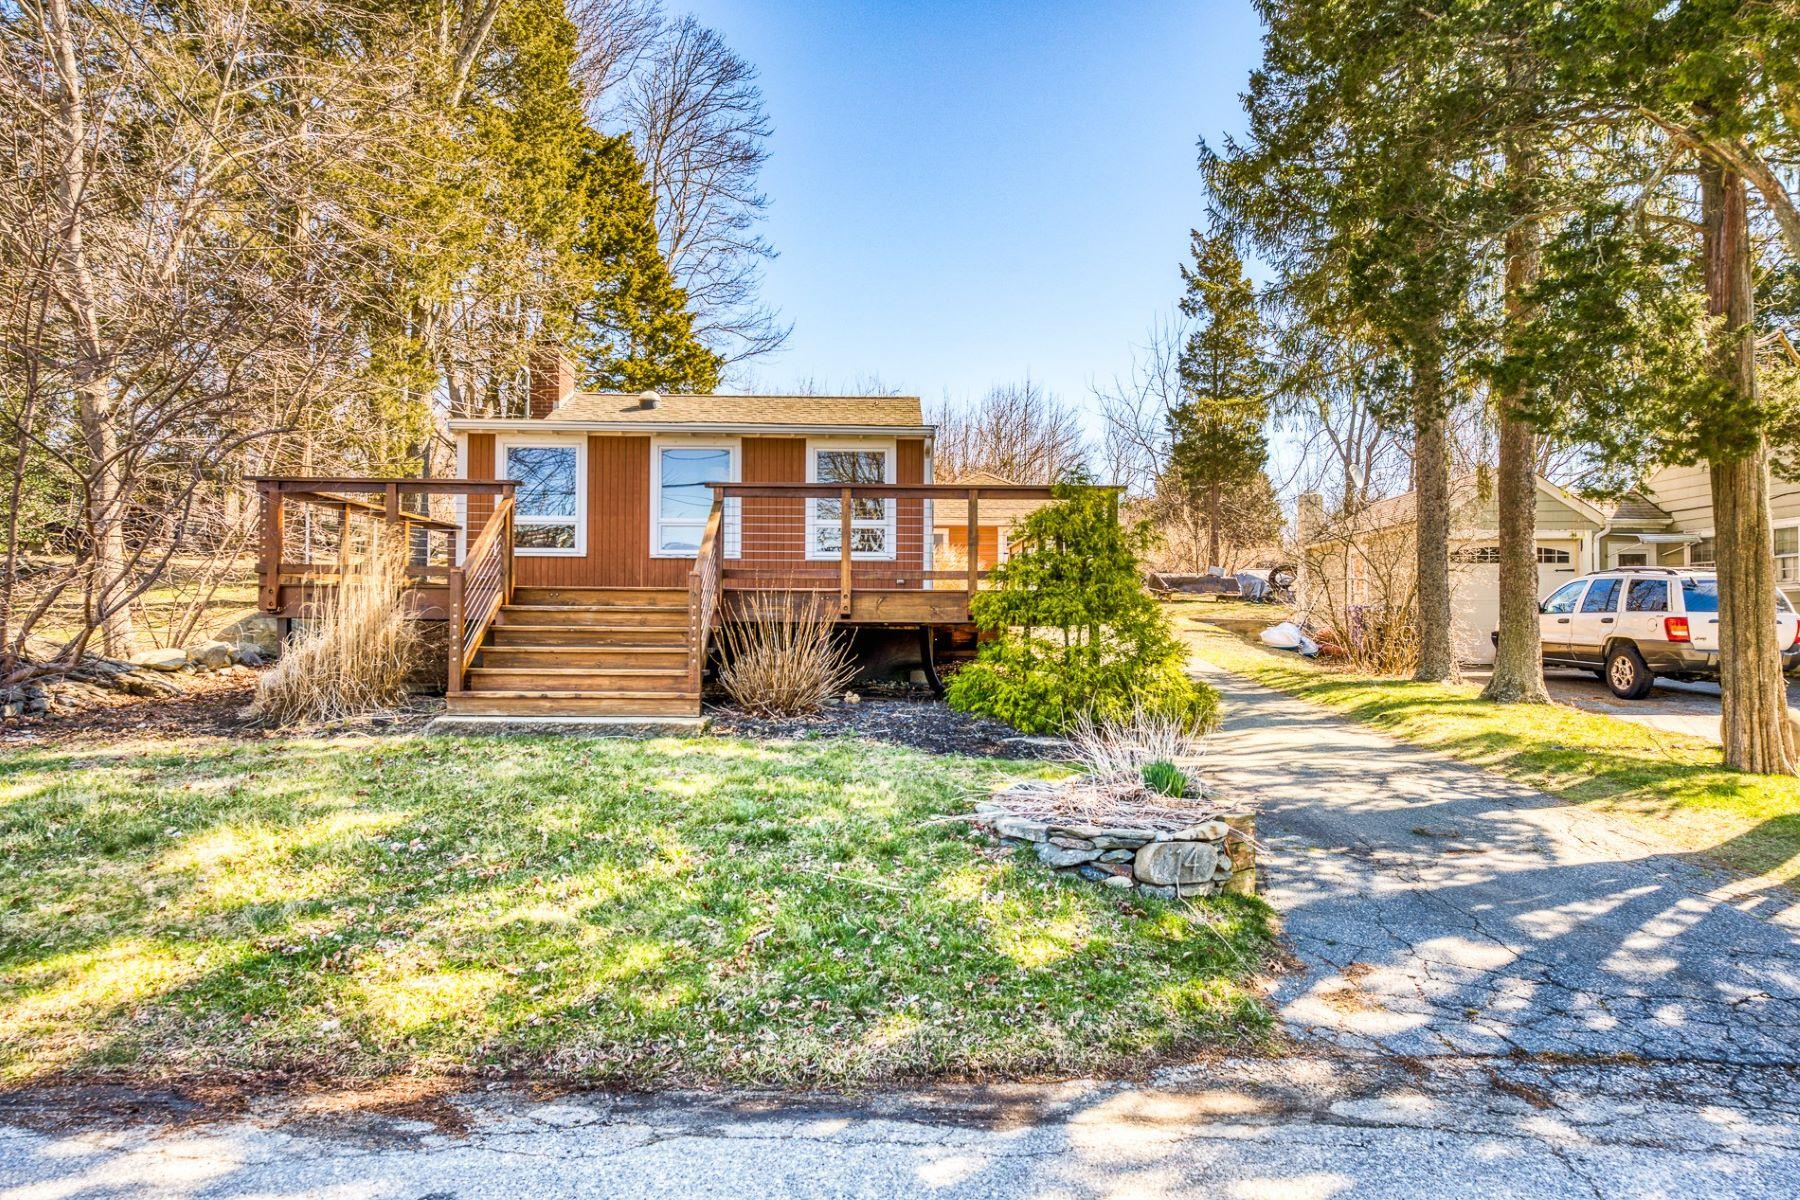 Single Family Homes for Sale at 14 Shore Drive, Warren, RI 14 Shore Drive Warren, Rhode Island 02885 United States